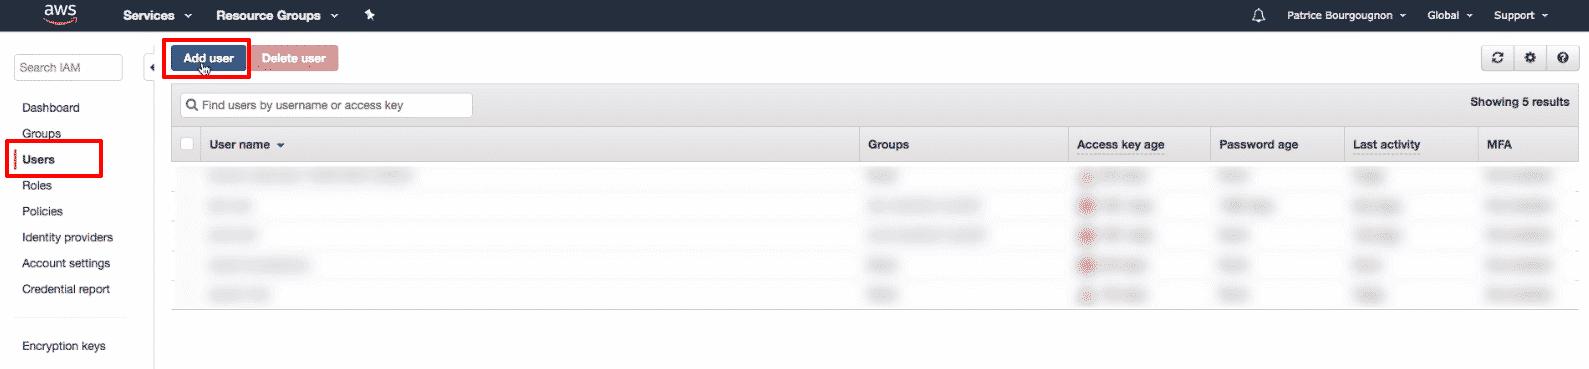 Amazon Elasticsearch: new user button